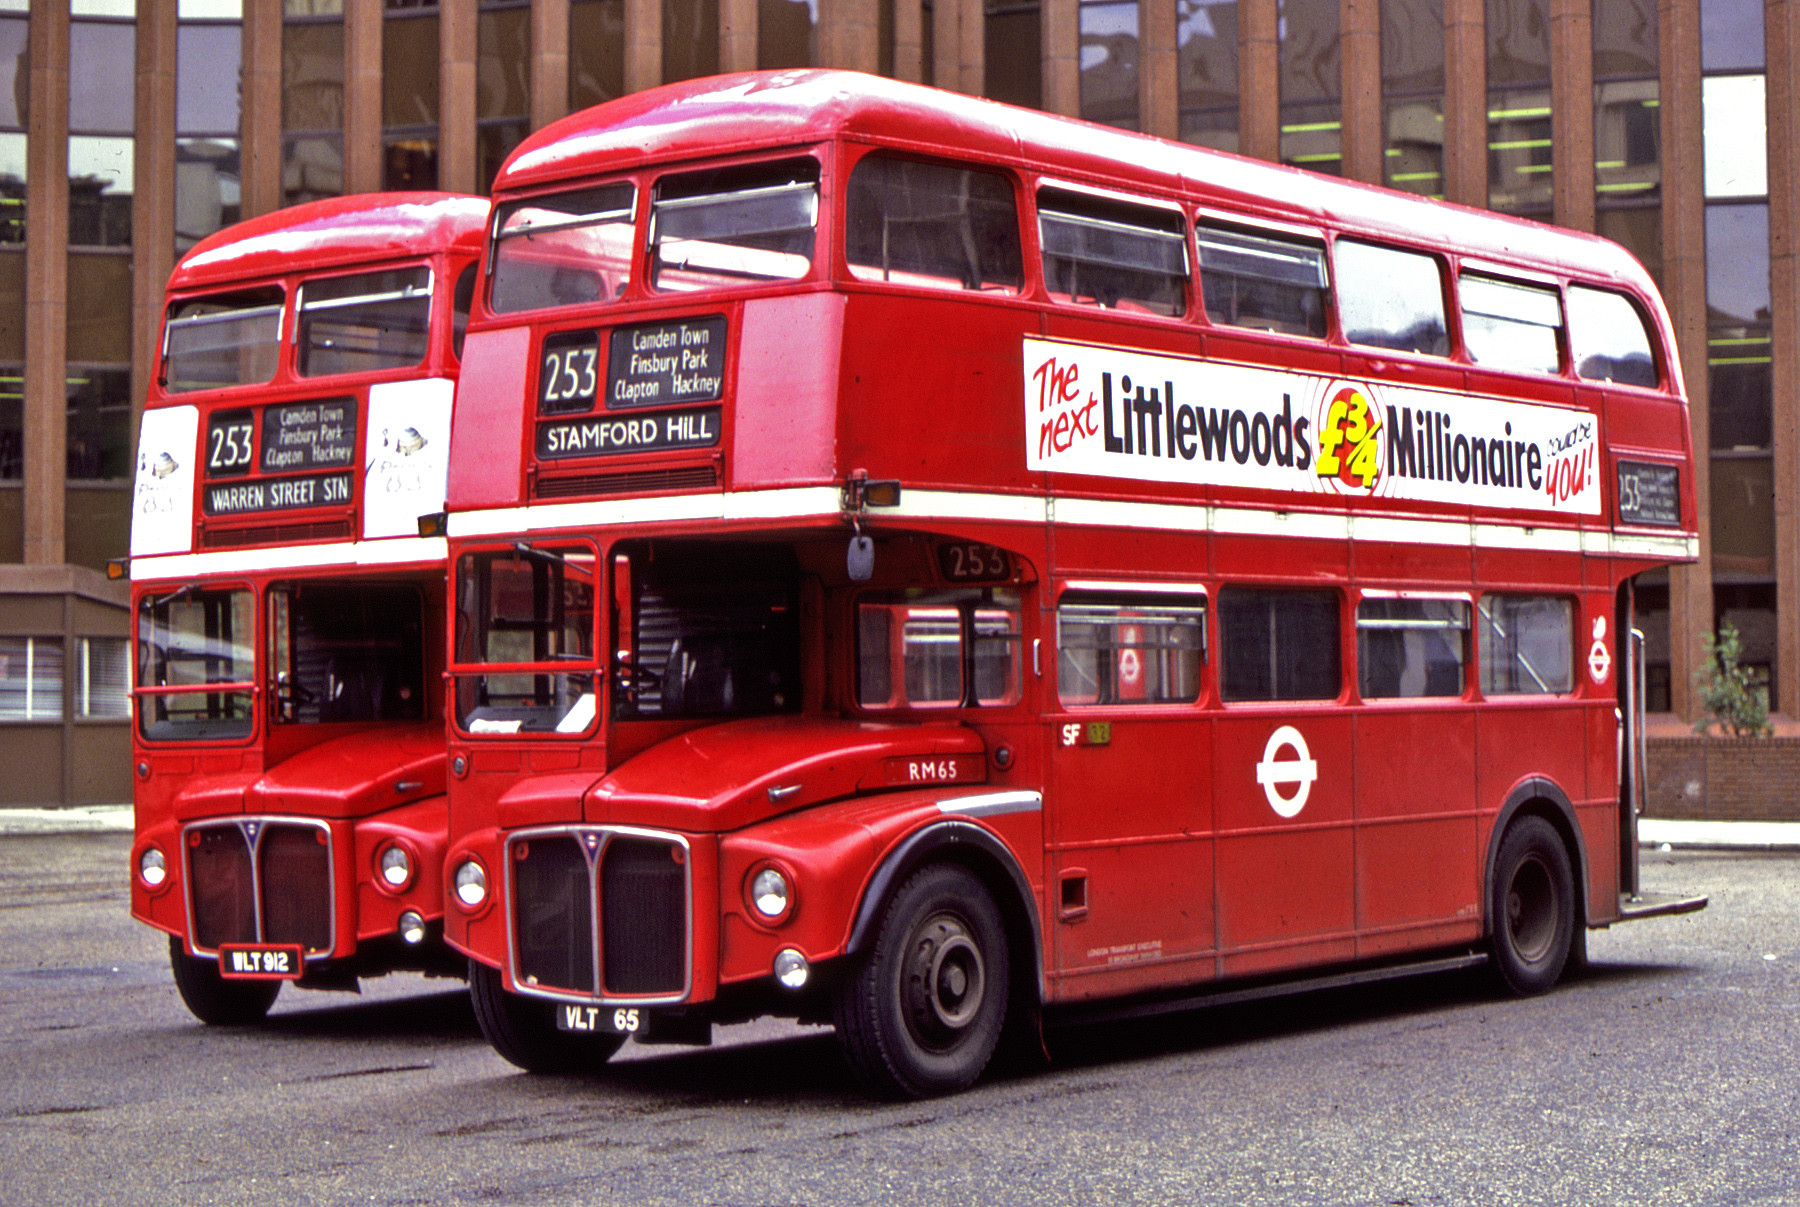 Londres - Visite panoramique